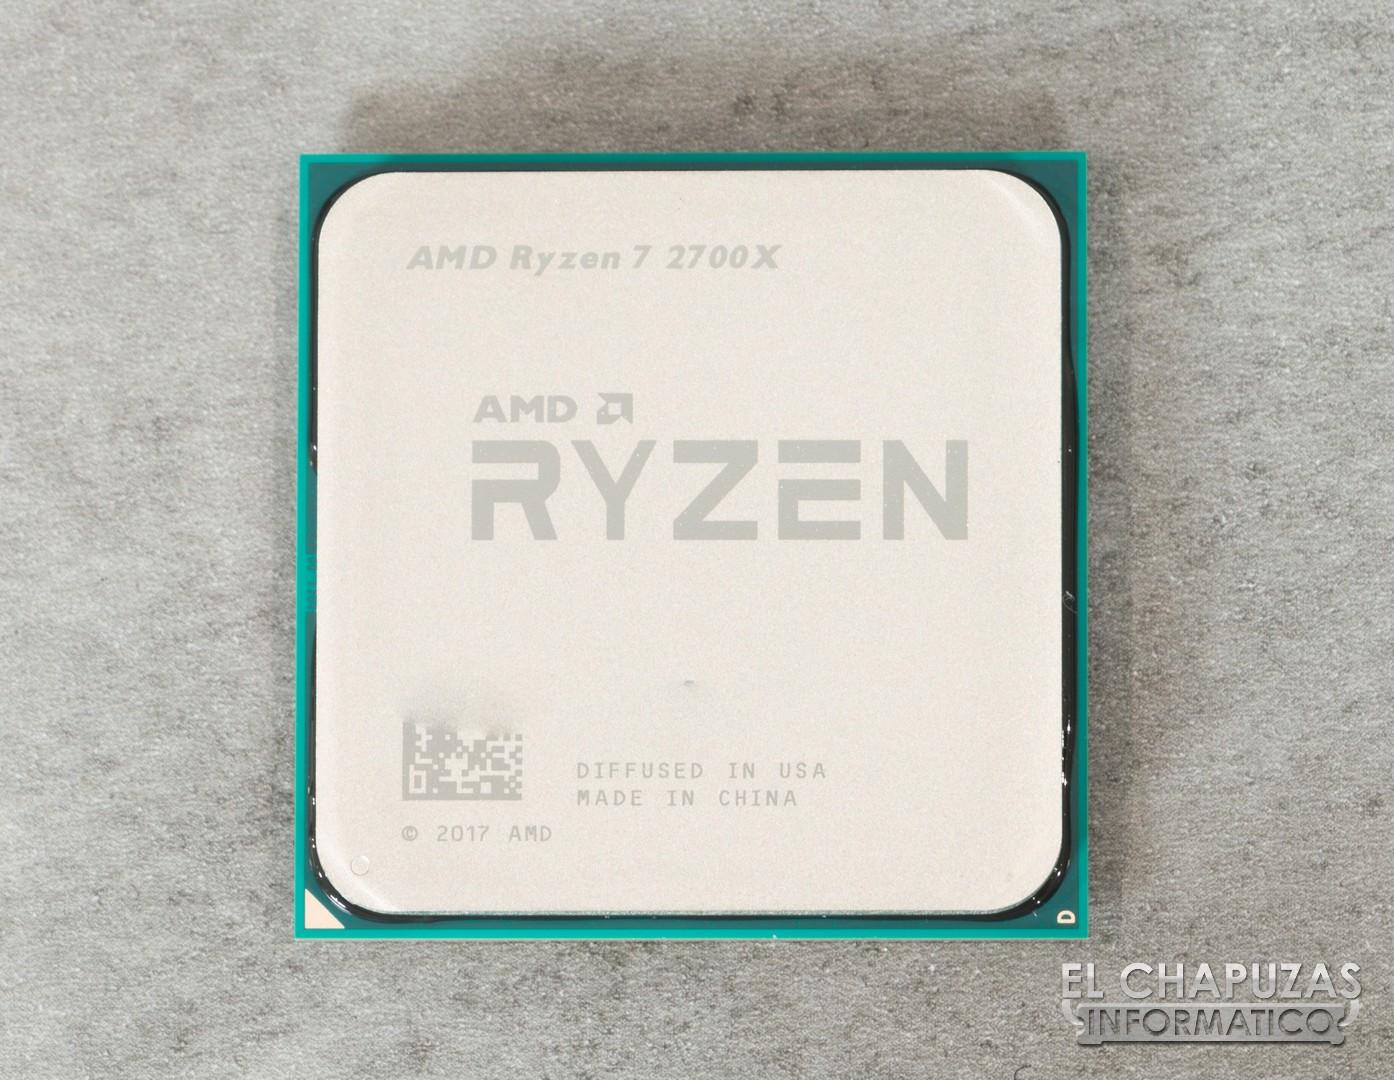 amd-ryzen-7-2700x-09-2